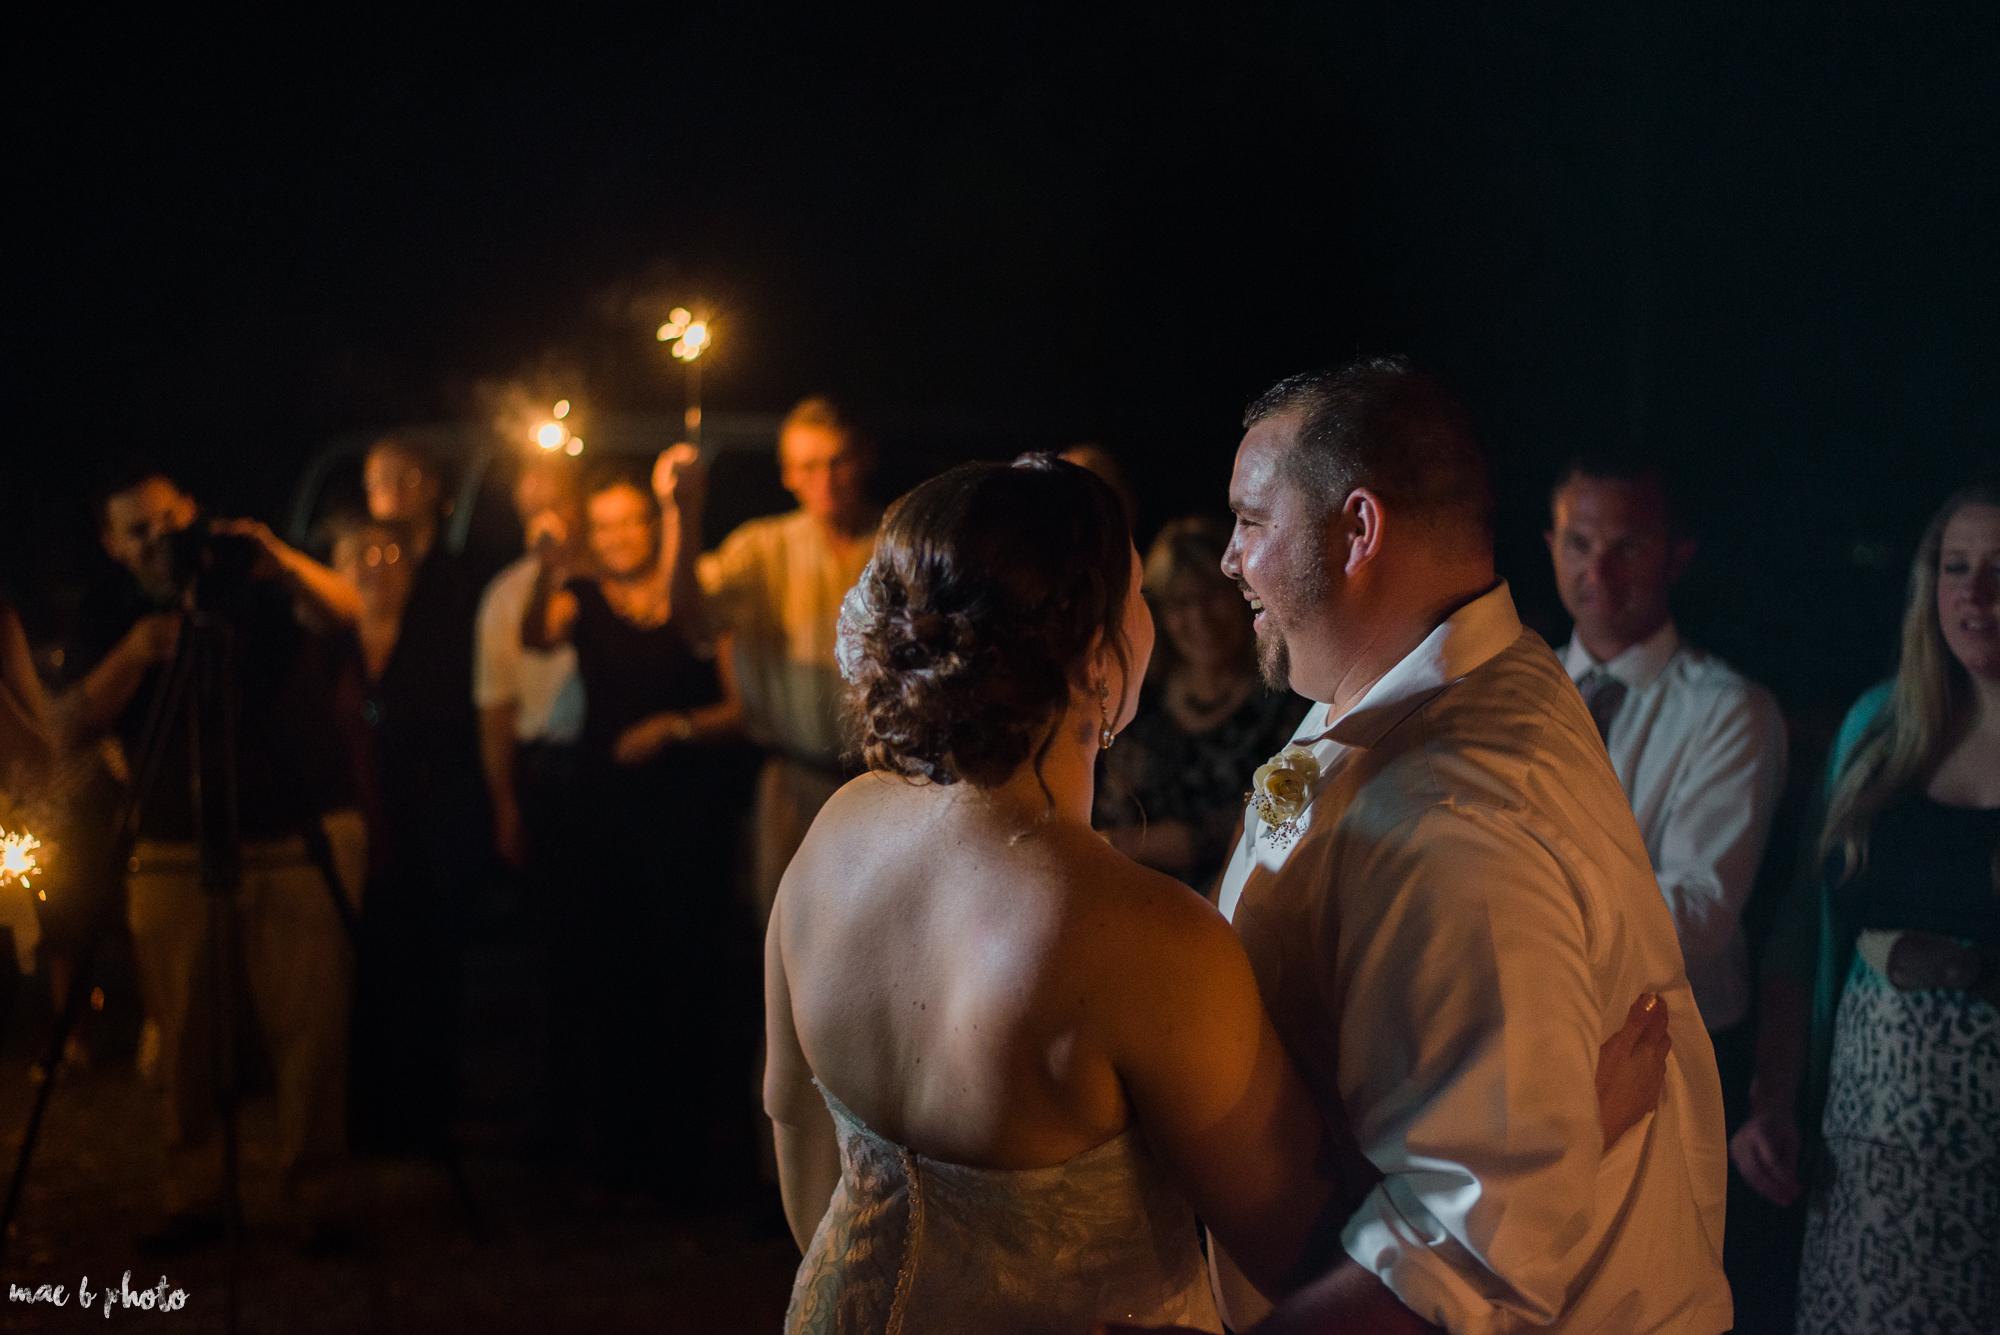 Sarah & Dustin's Rustic Chic Barn Wedding at Hartford Hill Winery in Hartford, Ohio by Mae B Photo-111.jpg